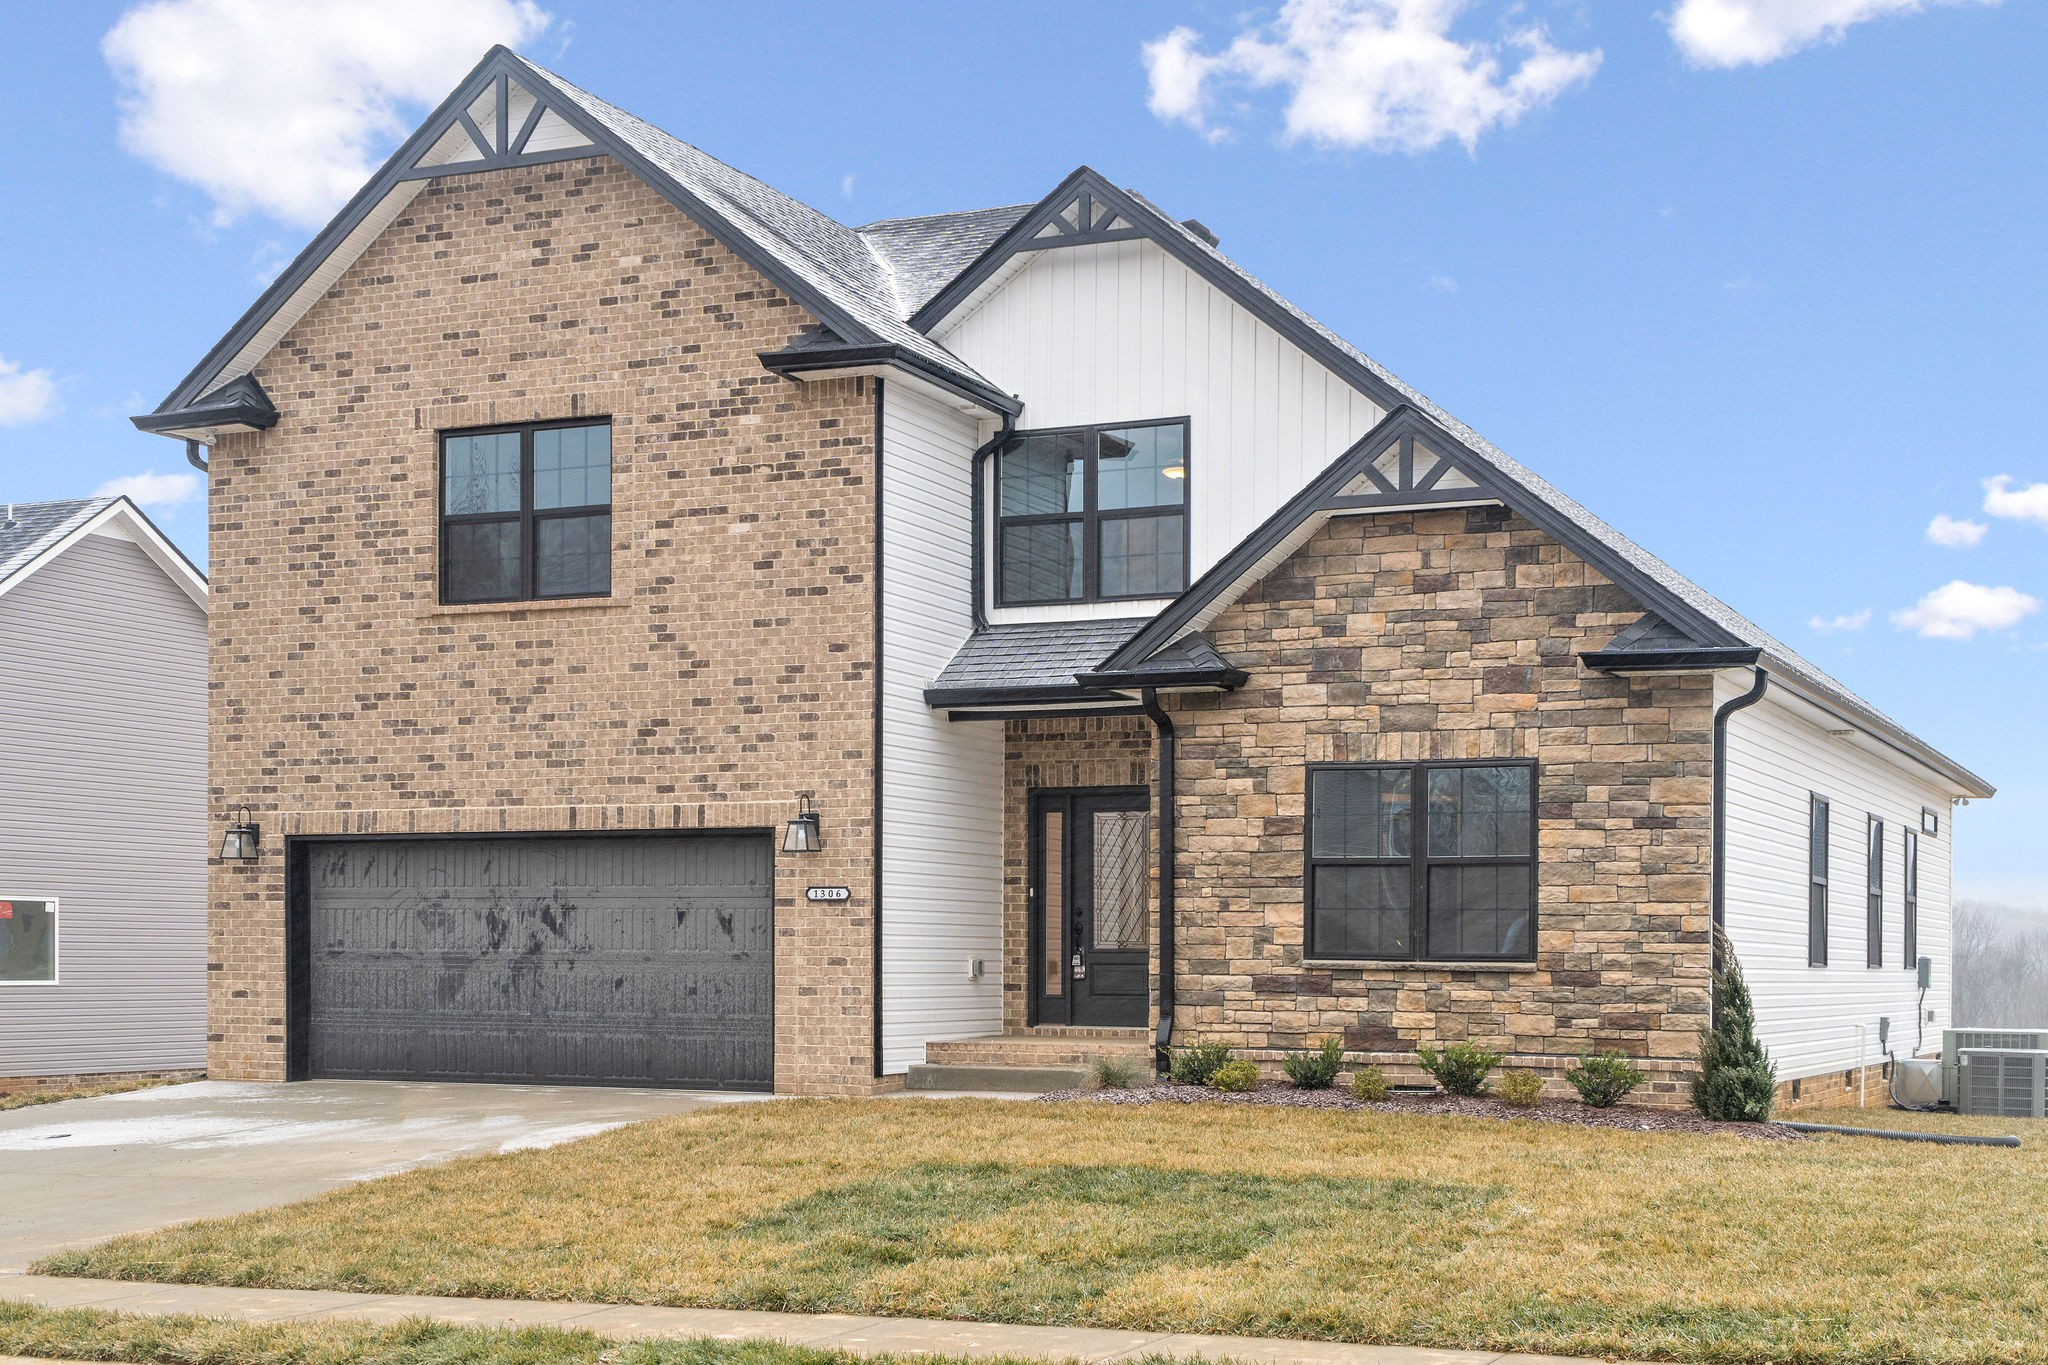 1286 Highgrove Ln Property Photo - Clarksville, TN real estate listing